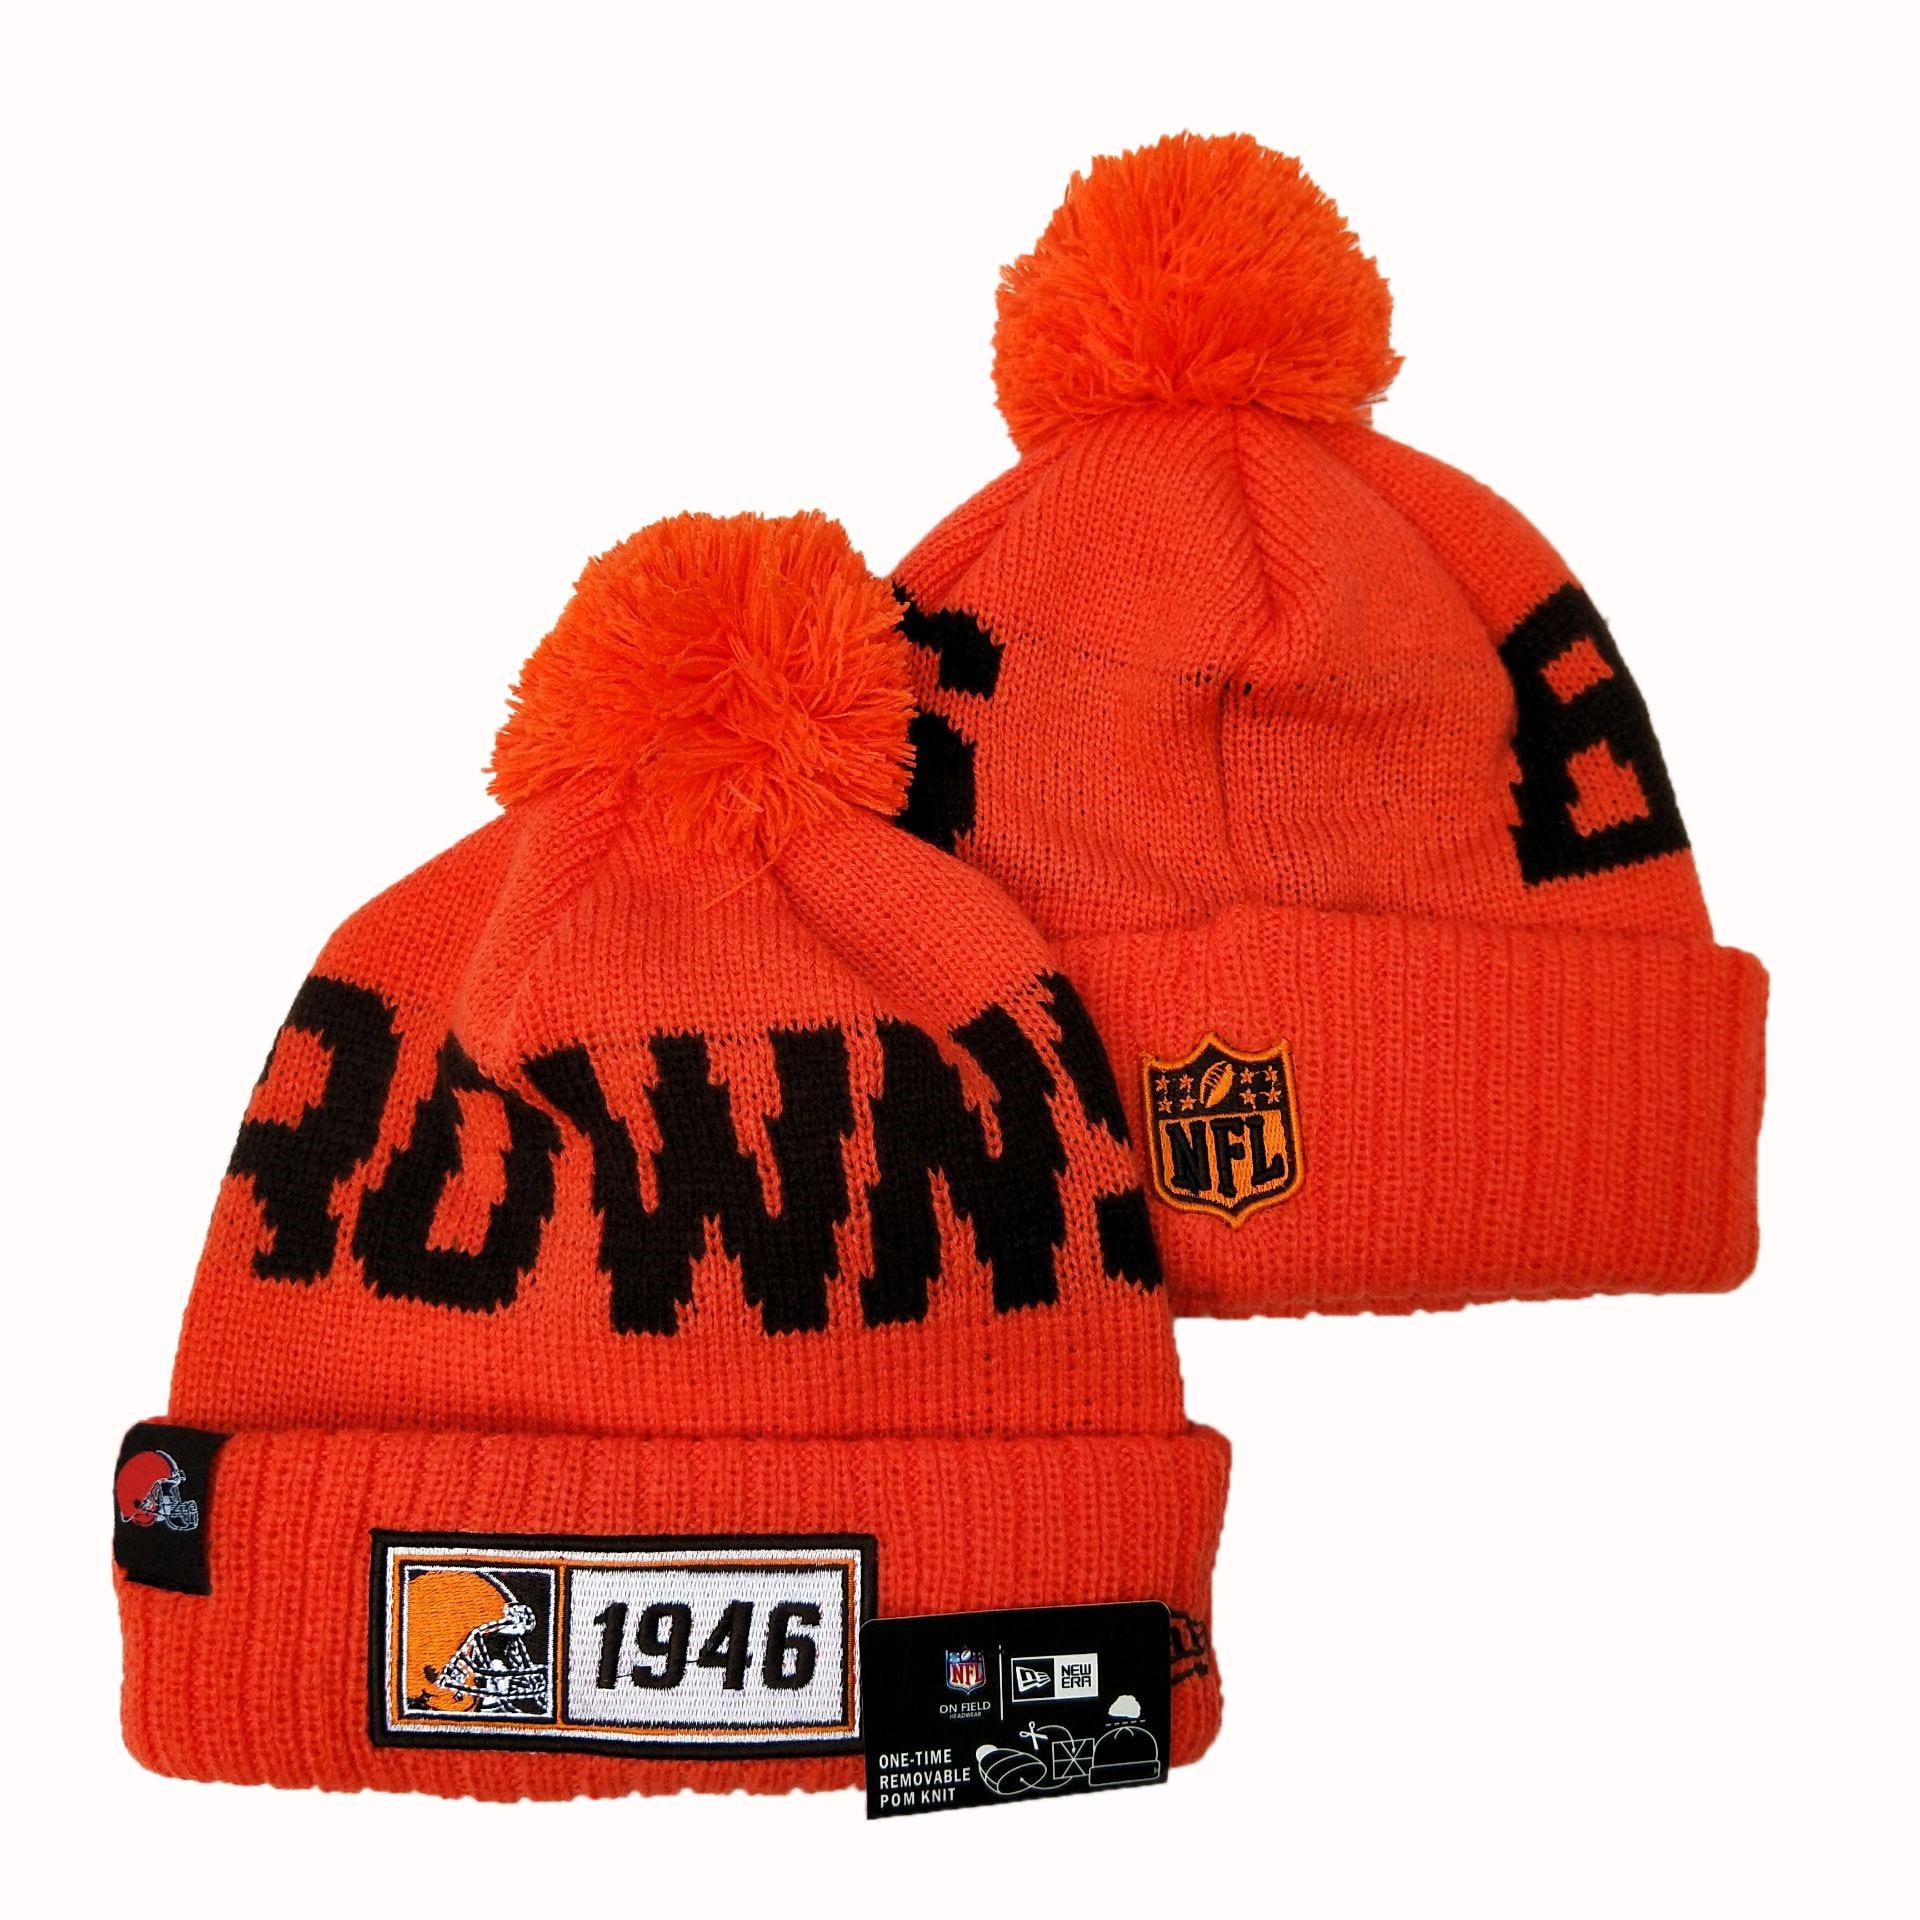 Browns Team Logo Orange Pom Knit Hat YD